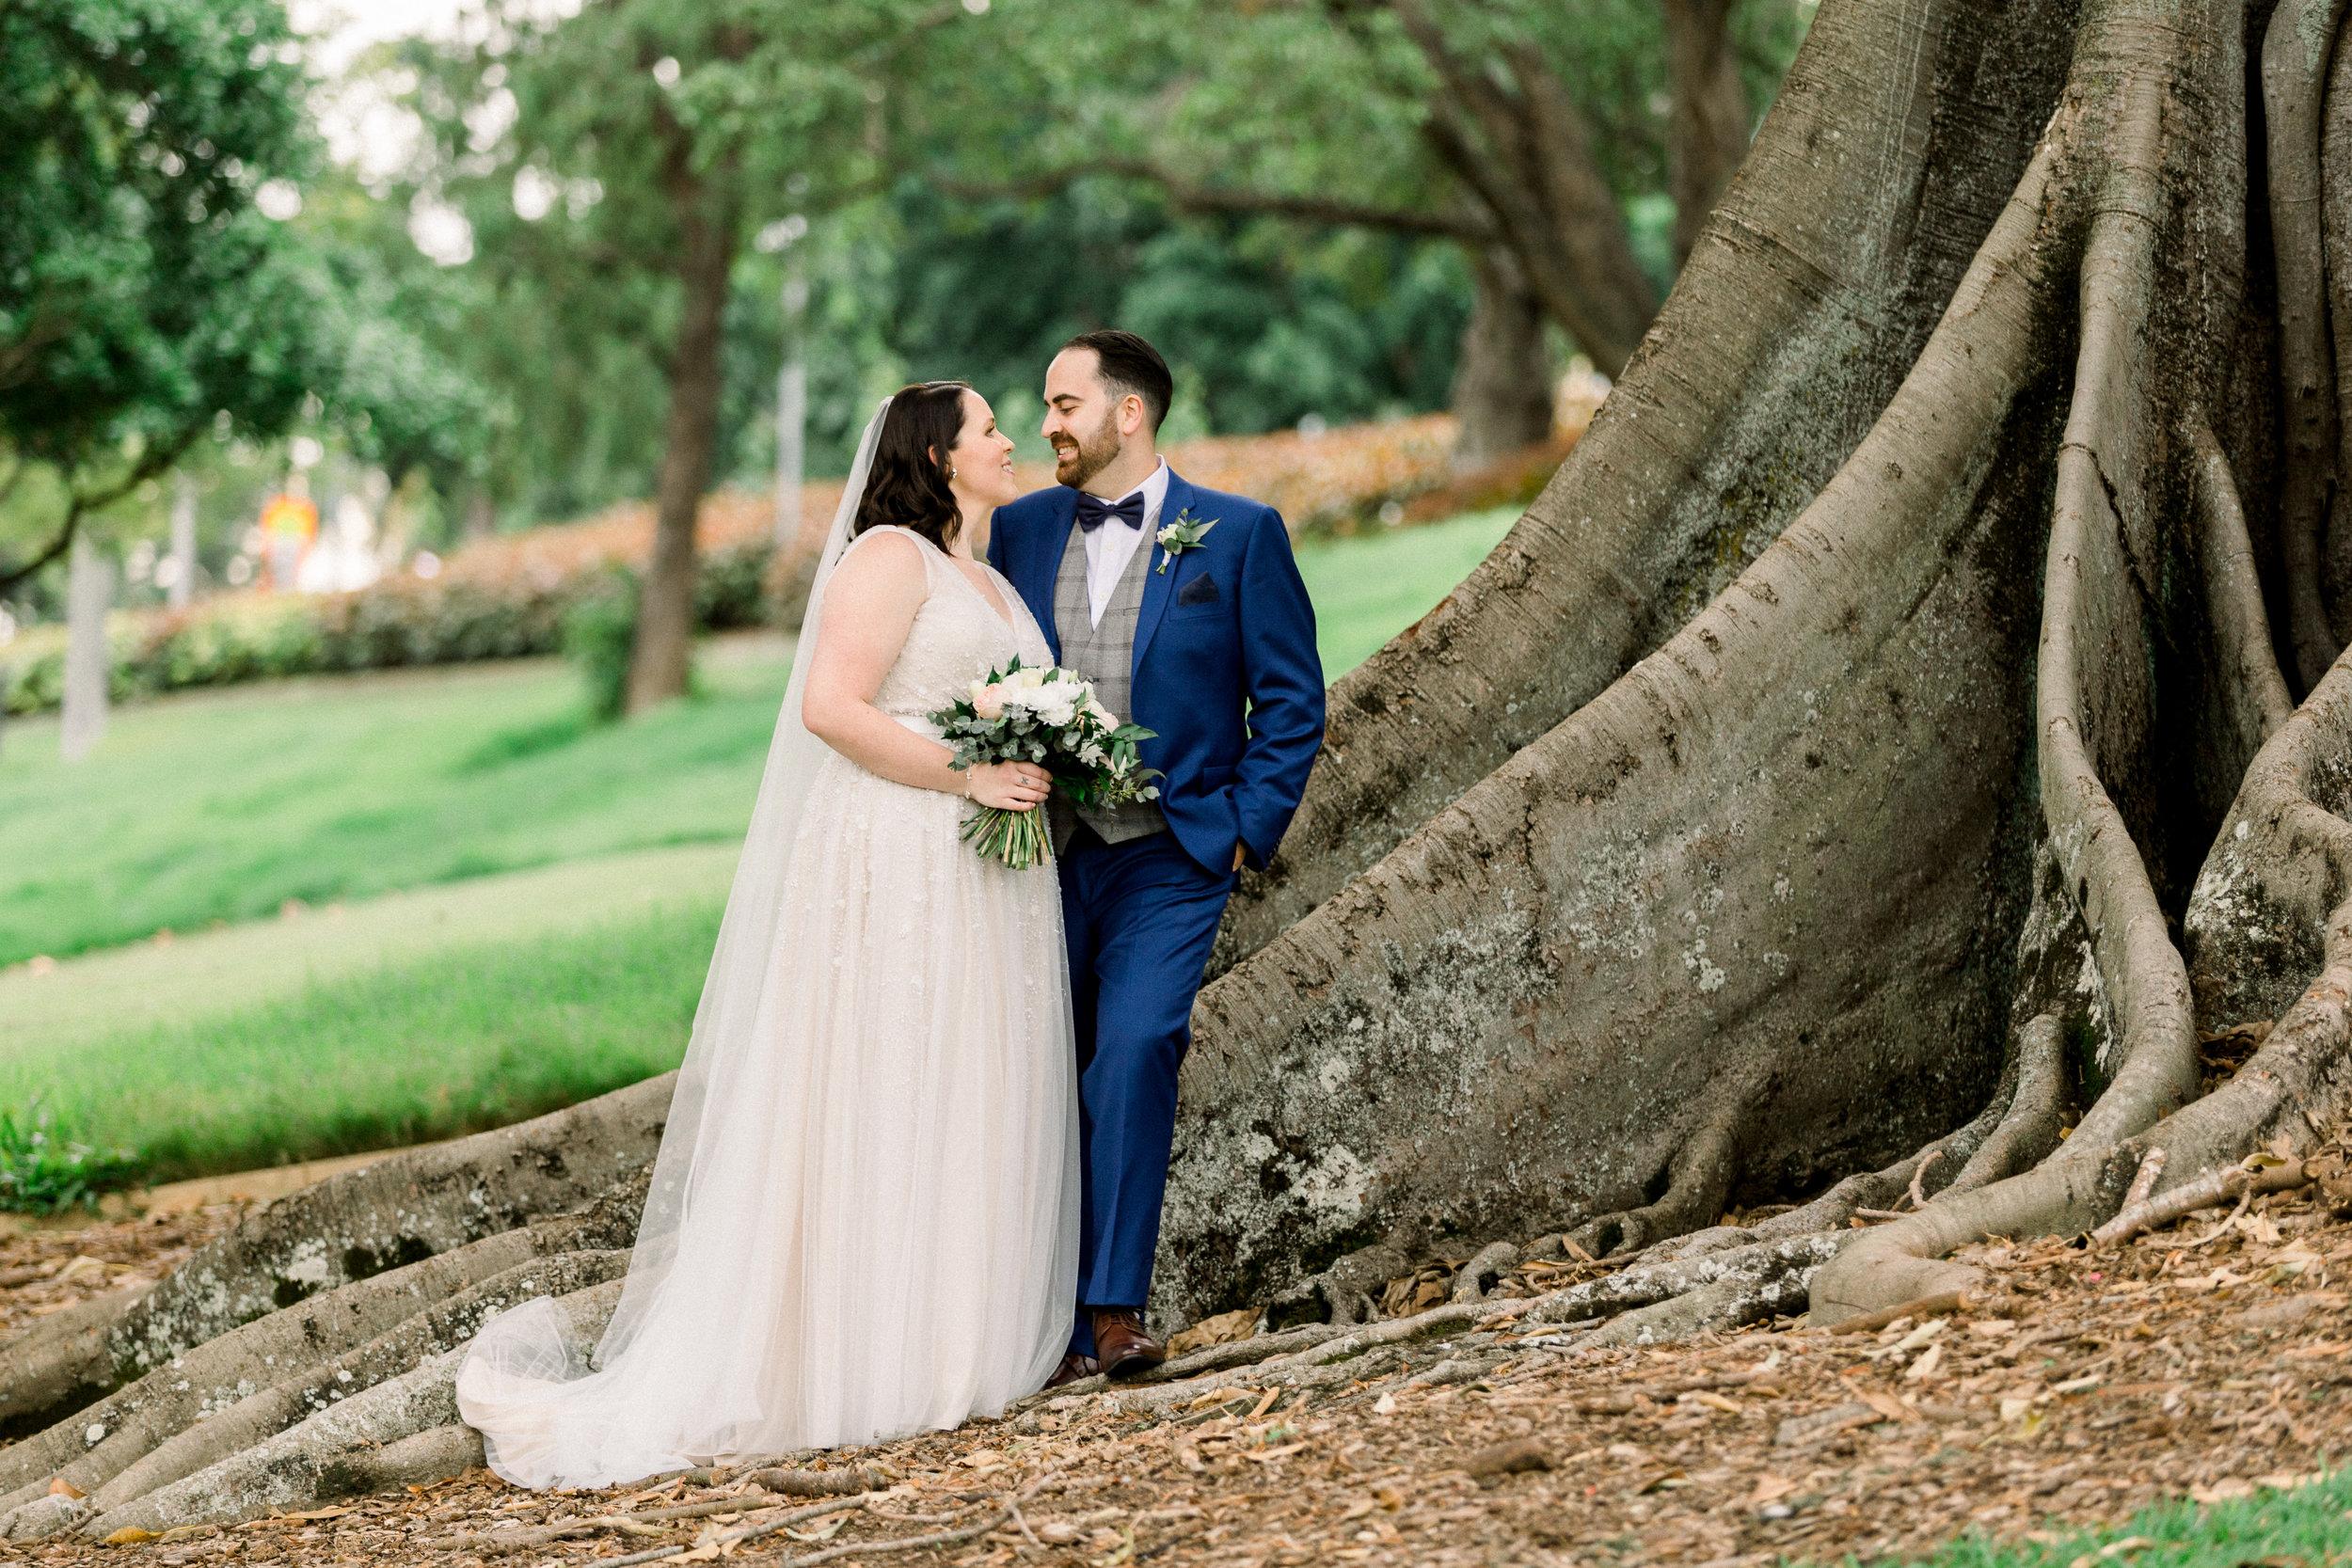 brisbane-city-wedding-photographer-romantic-wedding-73.jpg